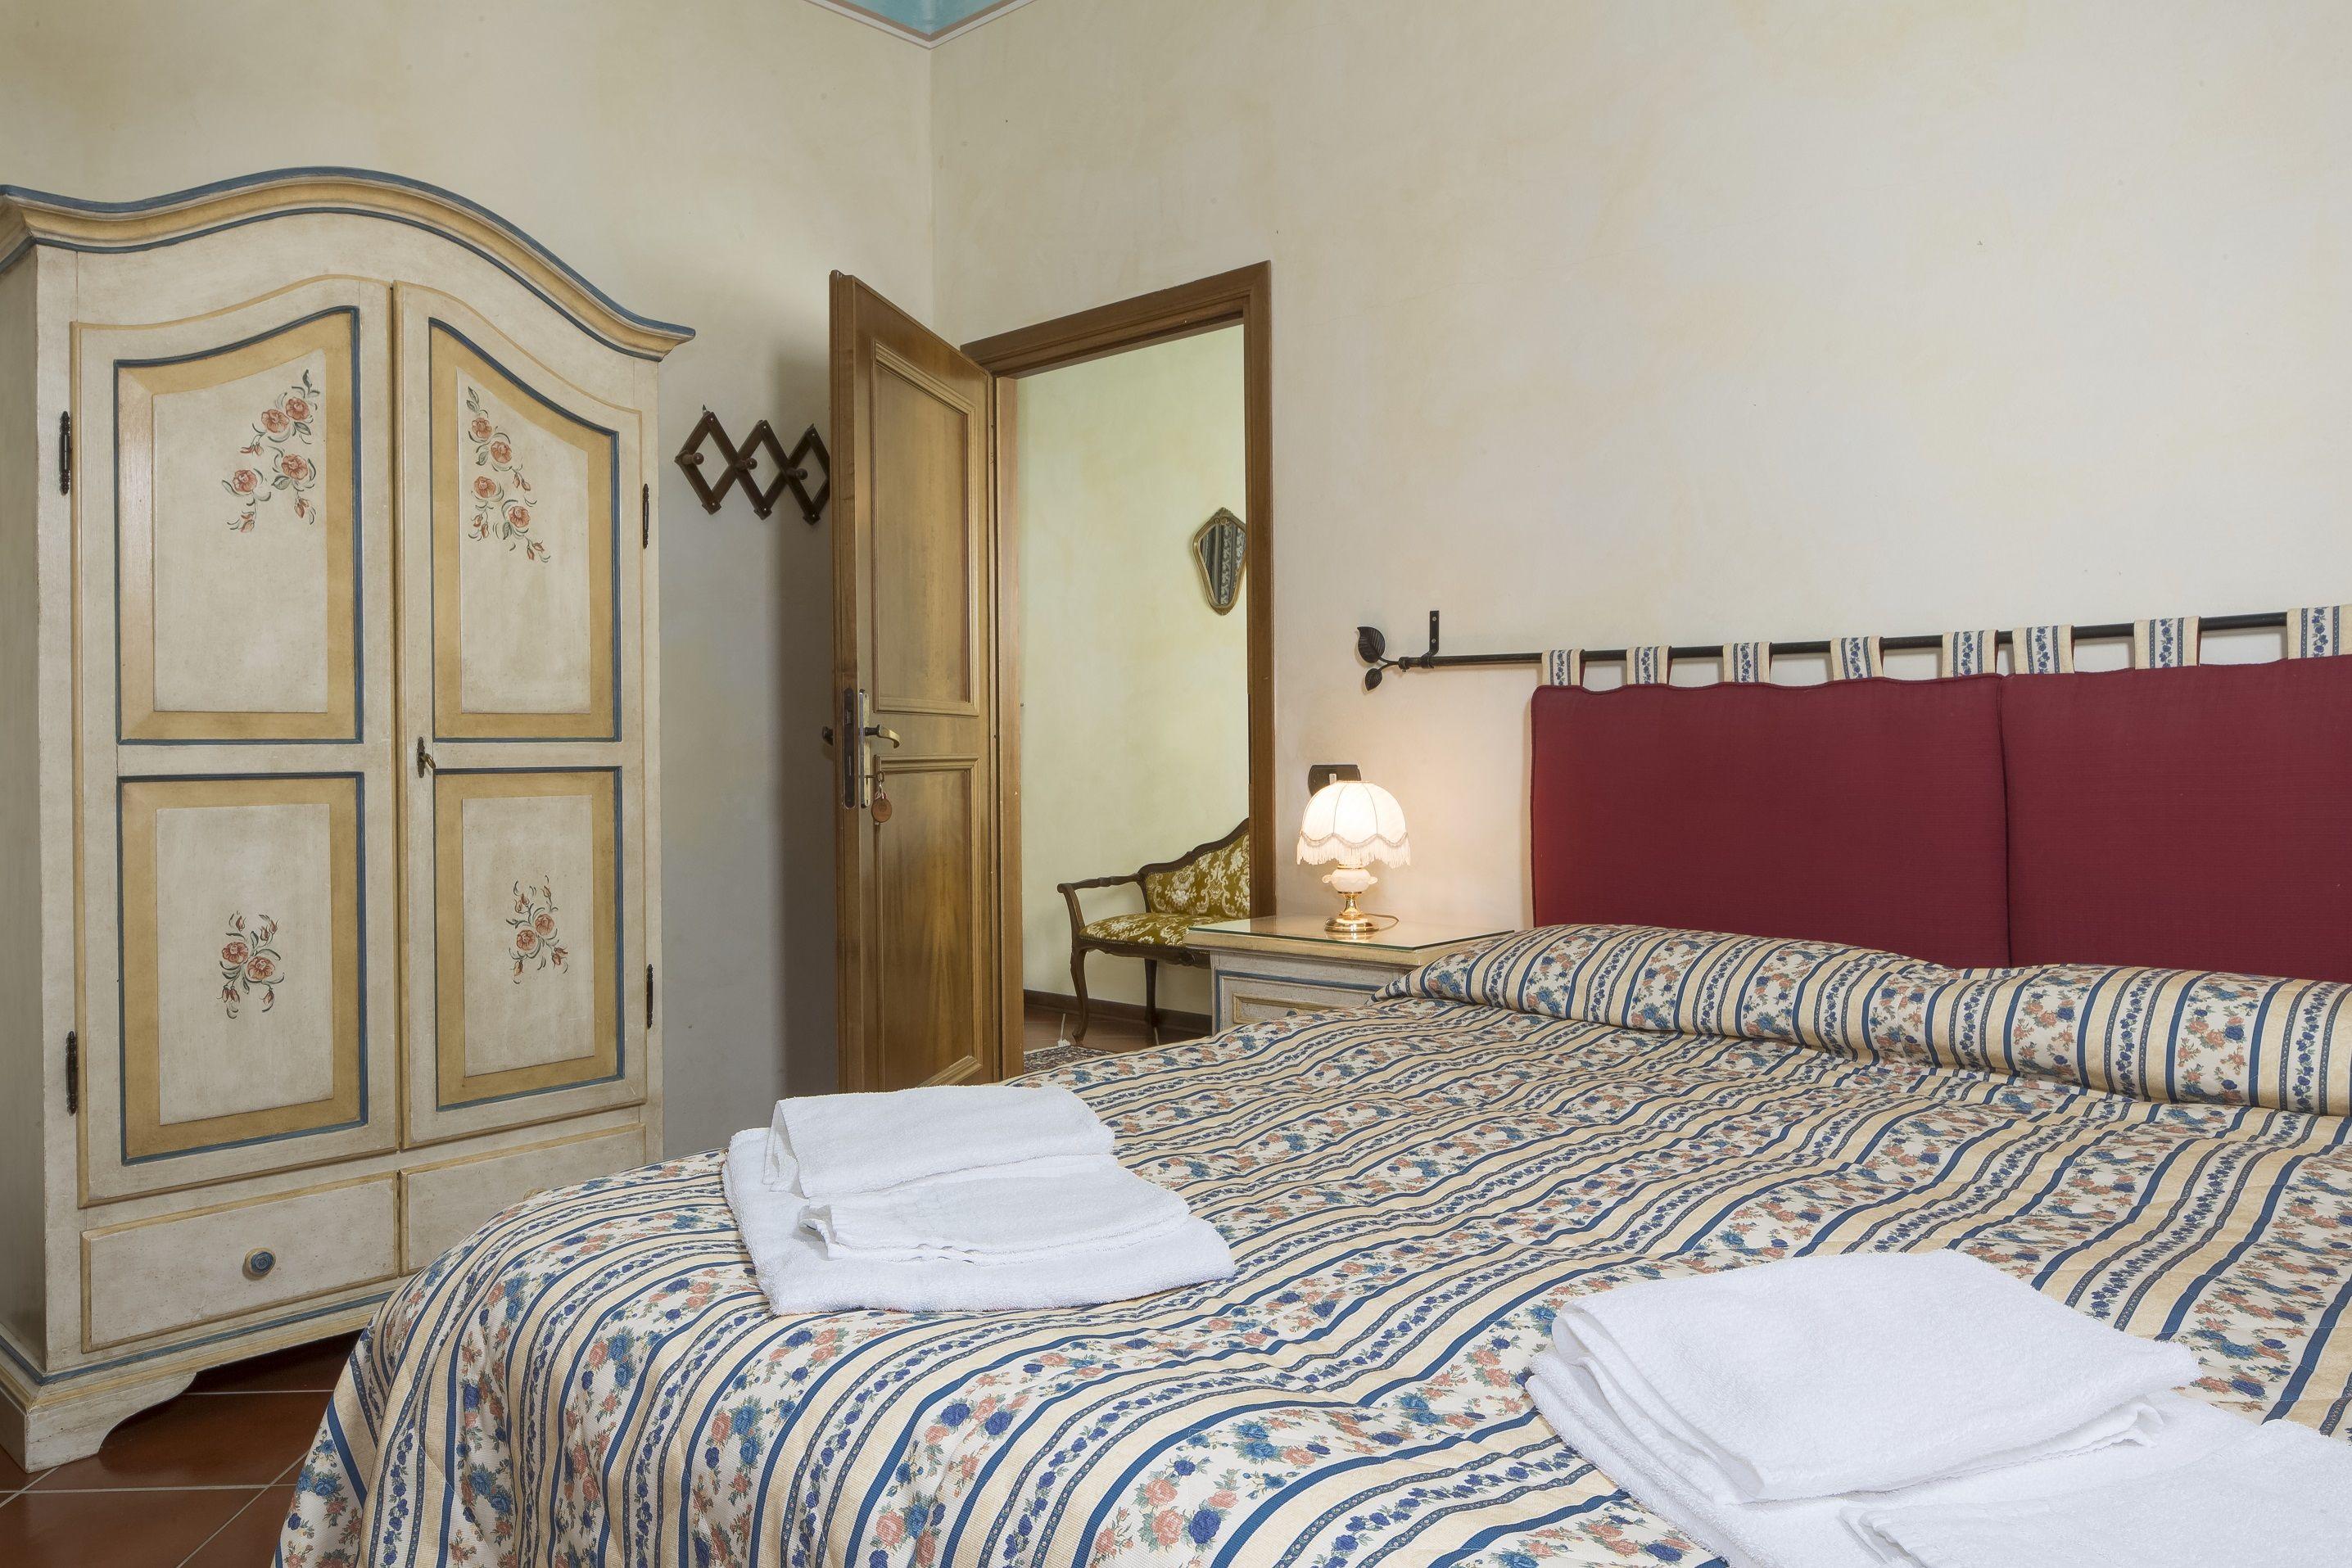 Apartment Bosco Lazzeroni Residence - Aida Holiday Home photo 18806778